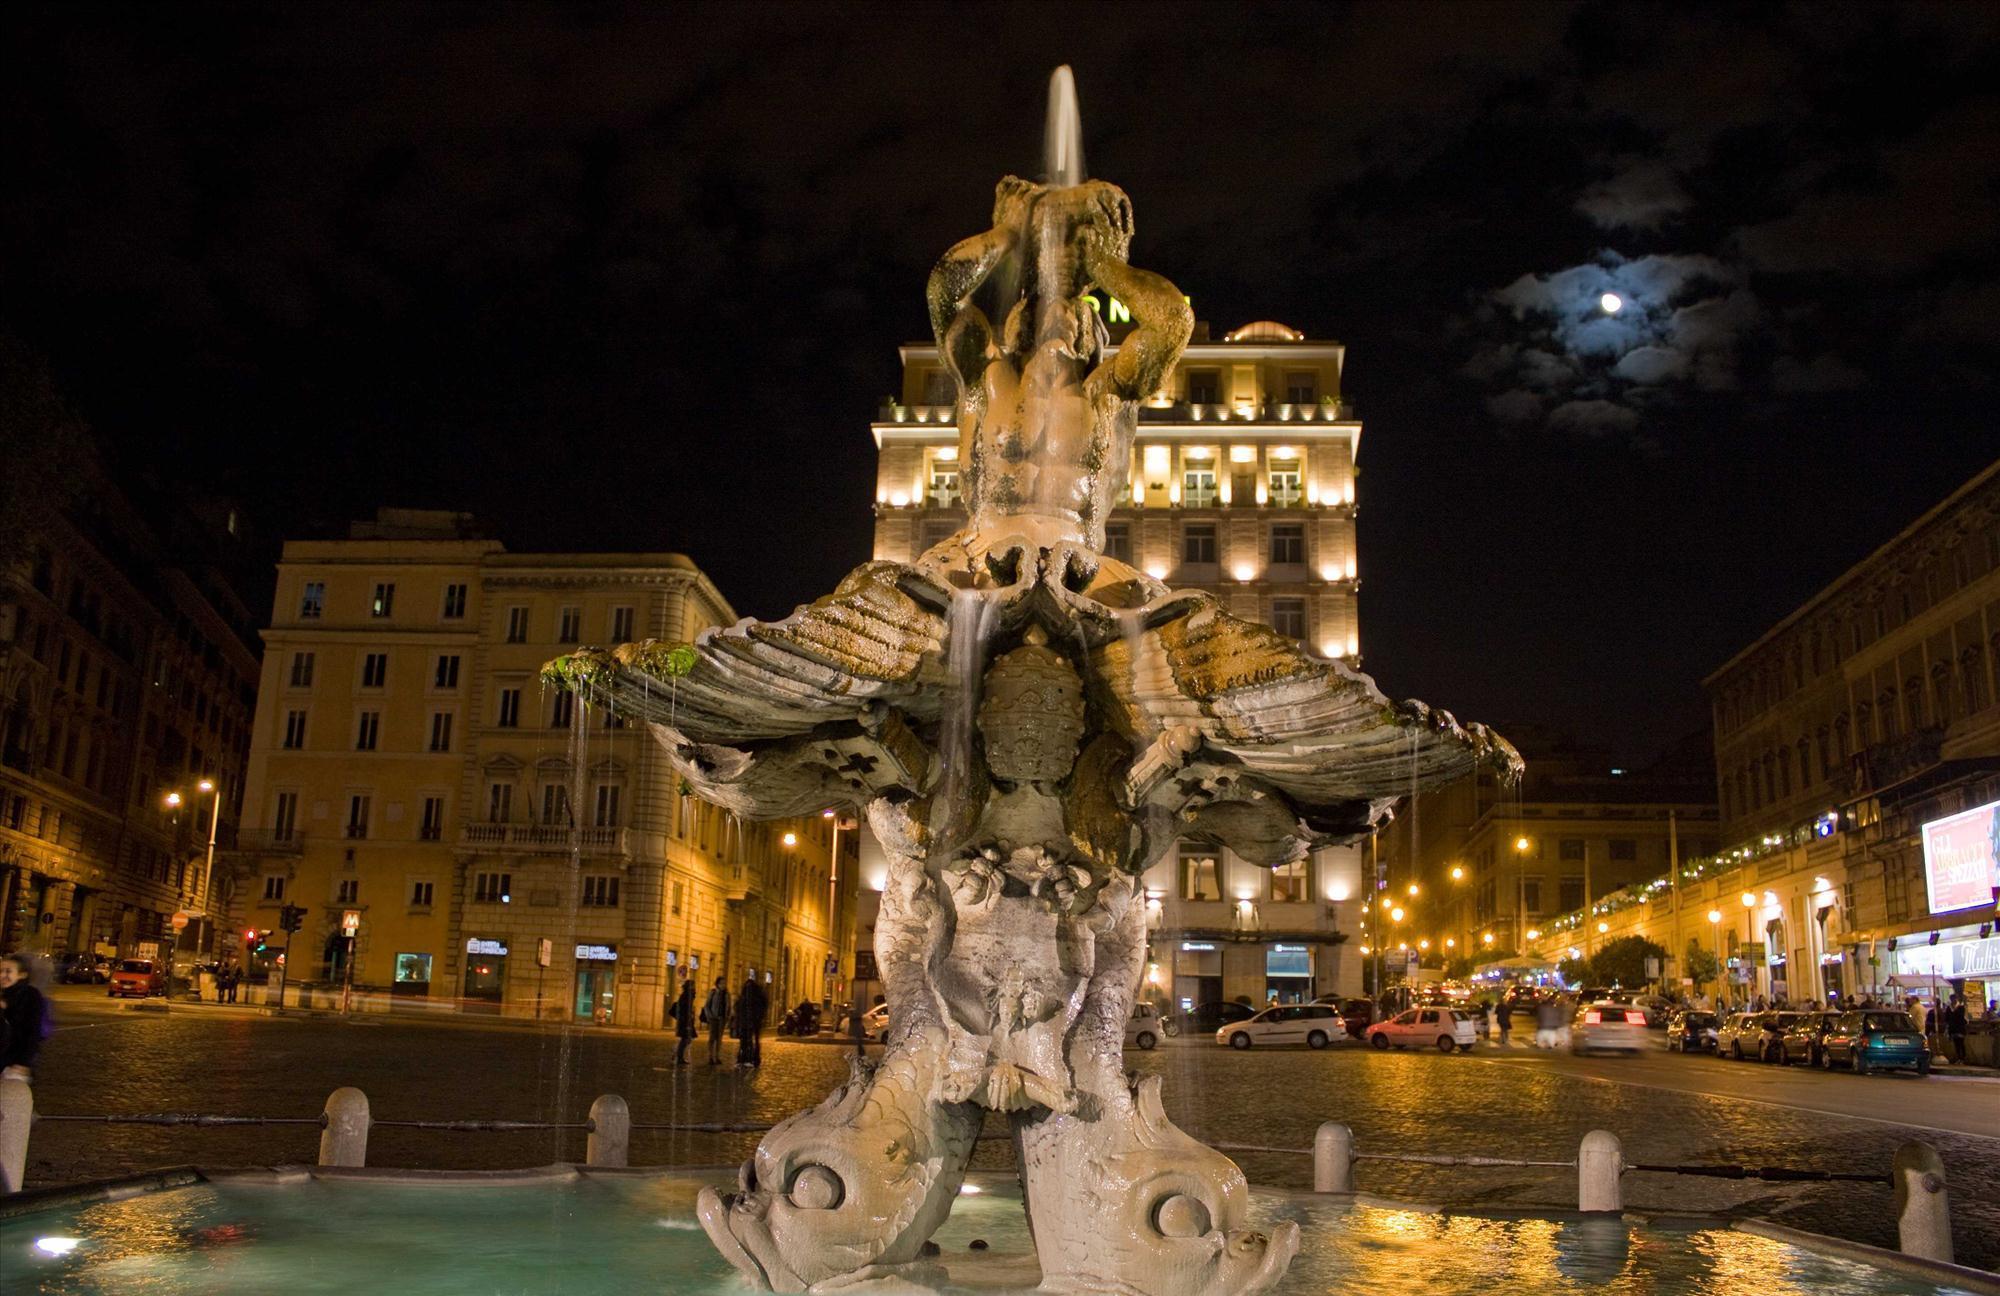 tritone-fountain-фонтан_Тритона_Рим_Италия